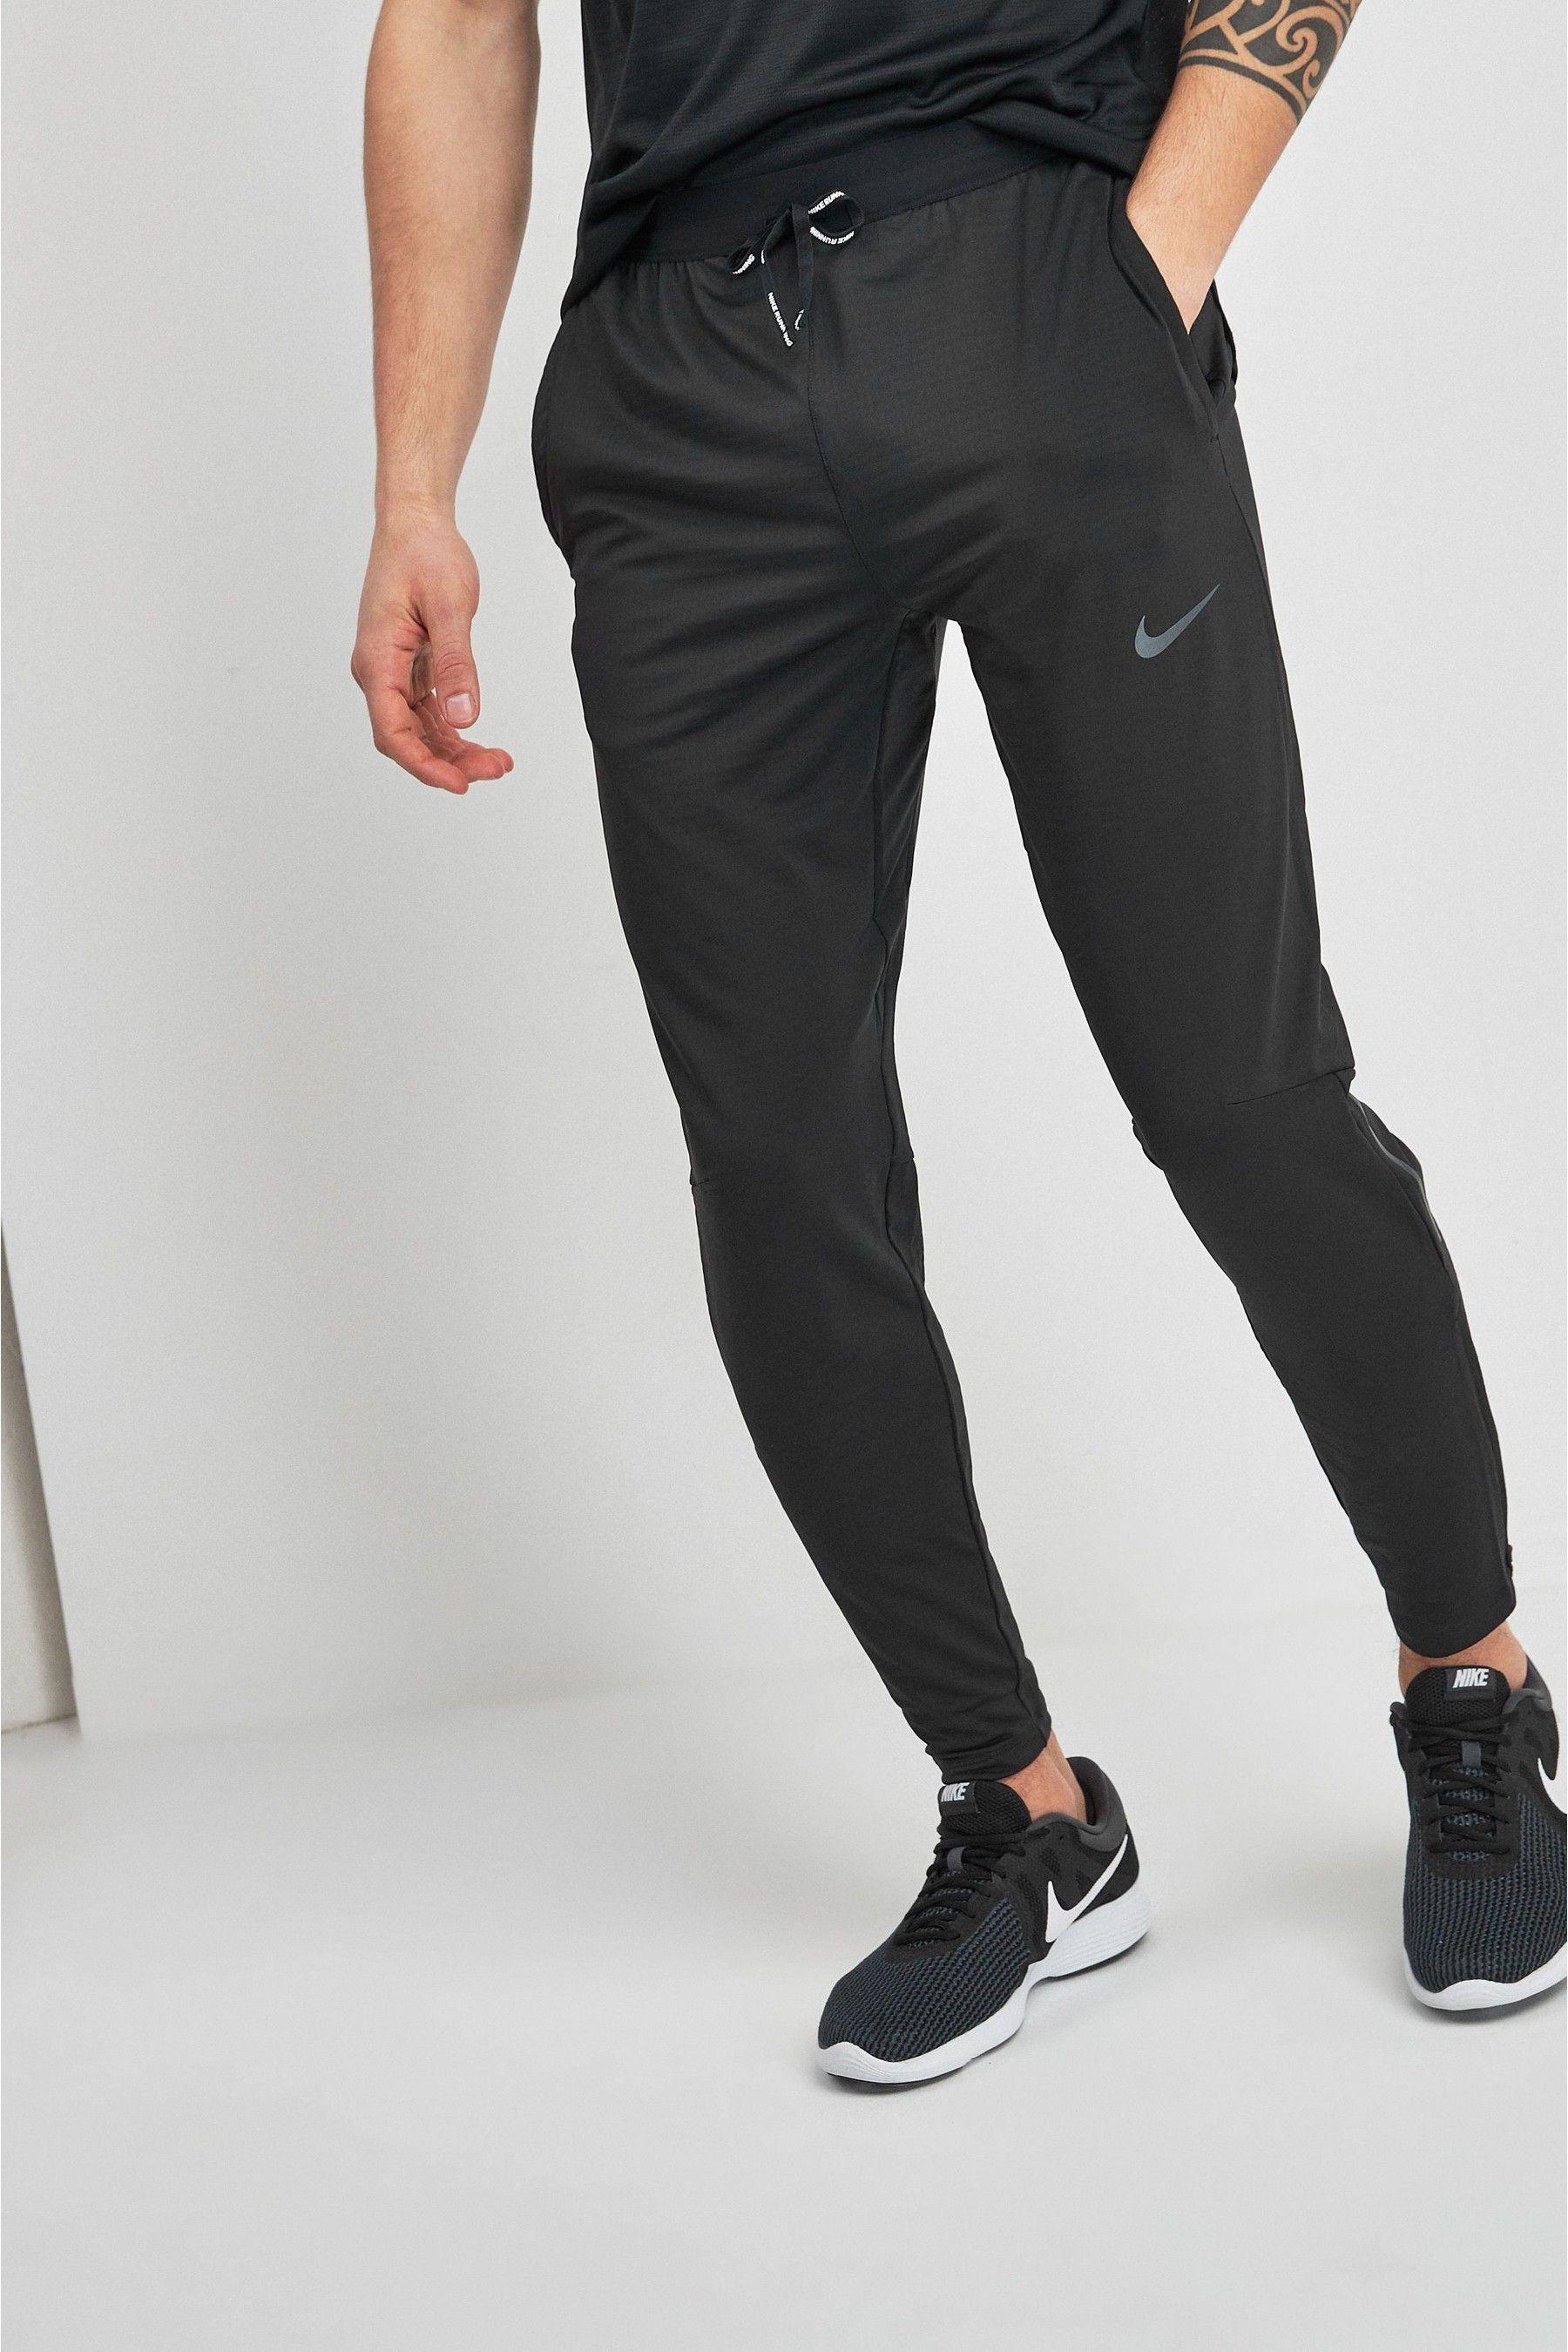 Mens Nike Black Phenom Running Joggers - Black | Black nikes ...